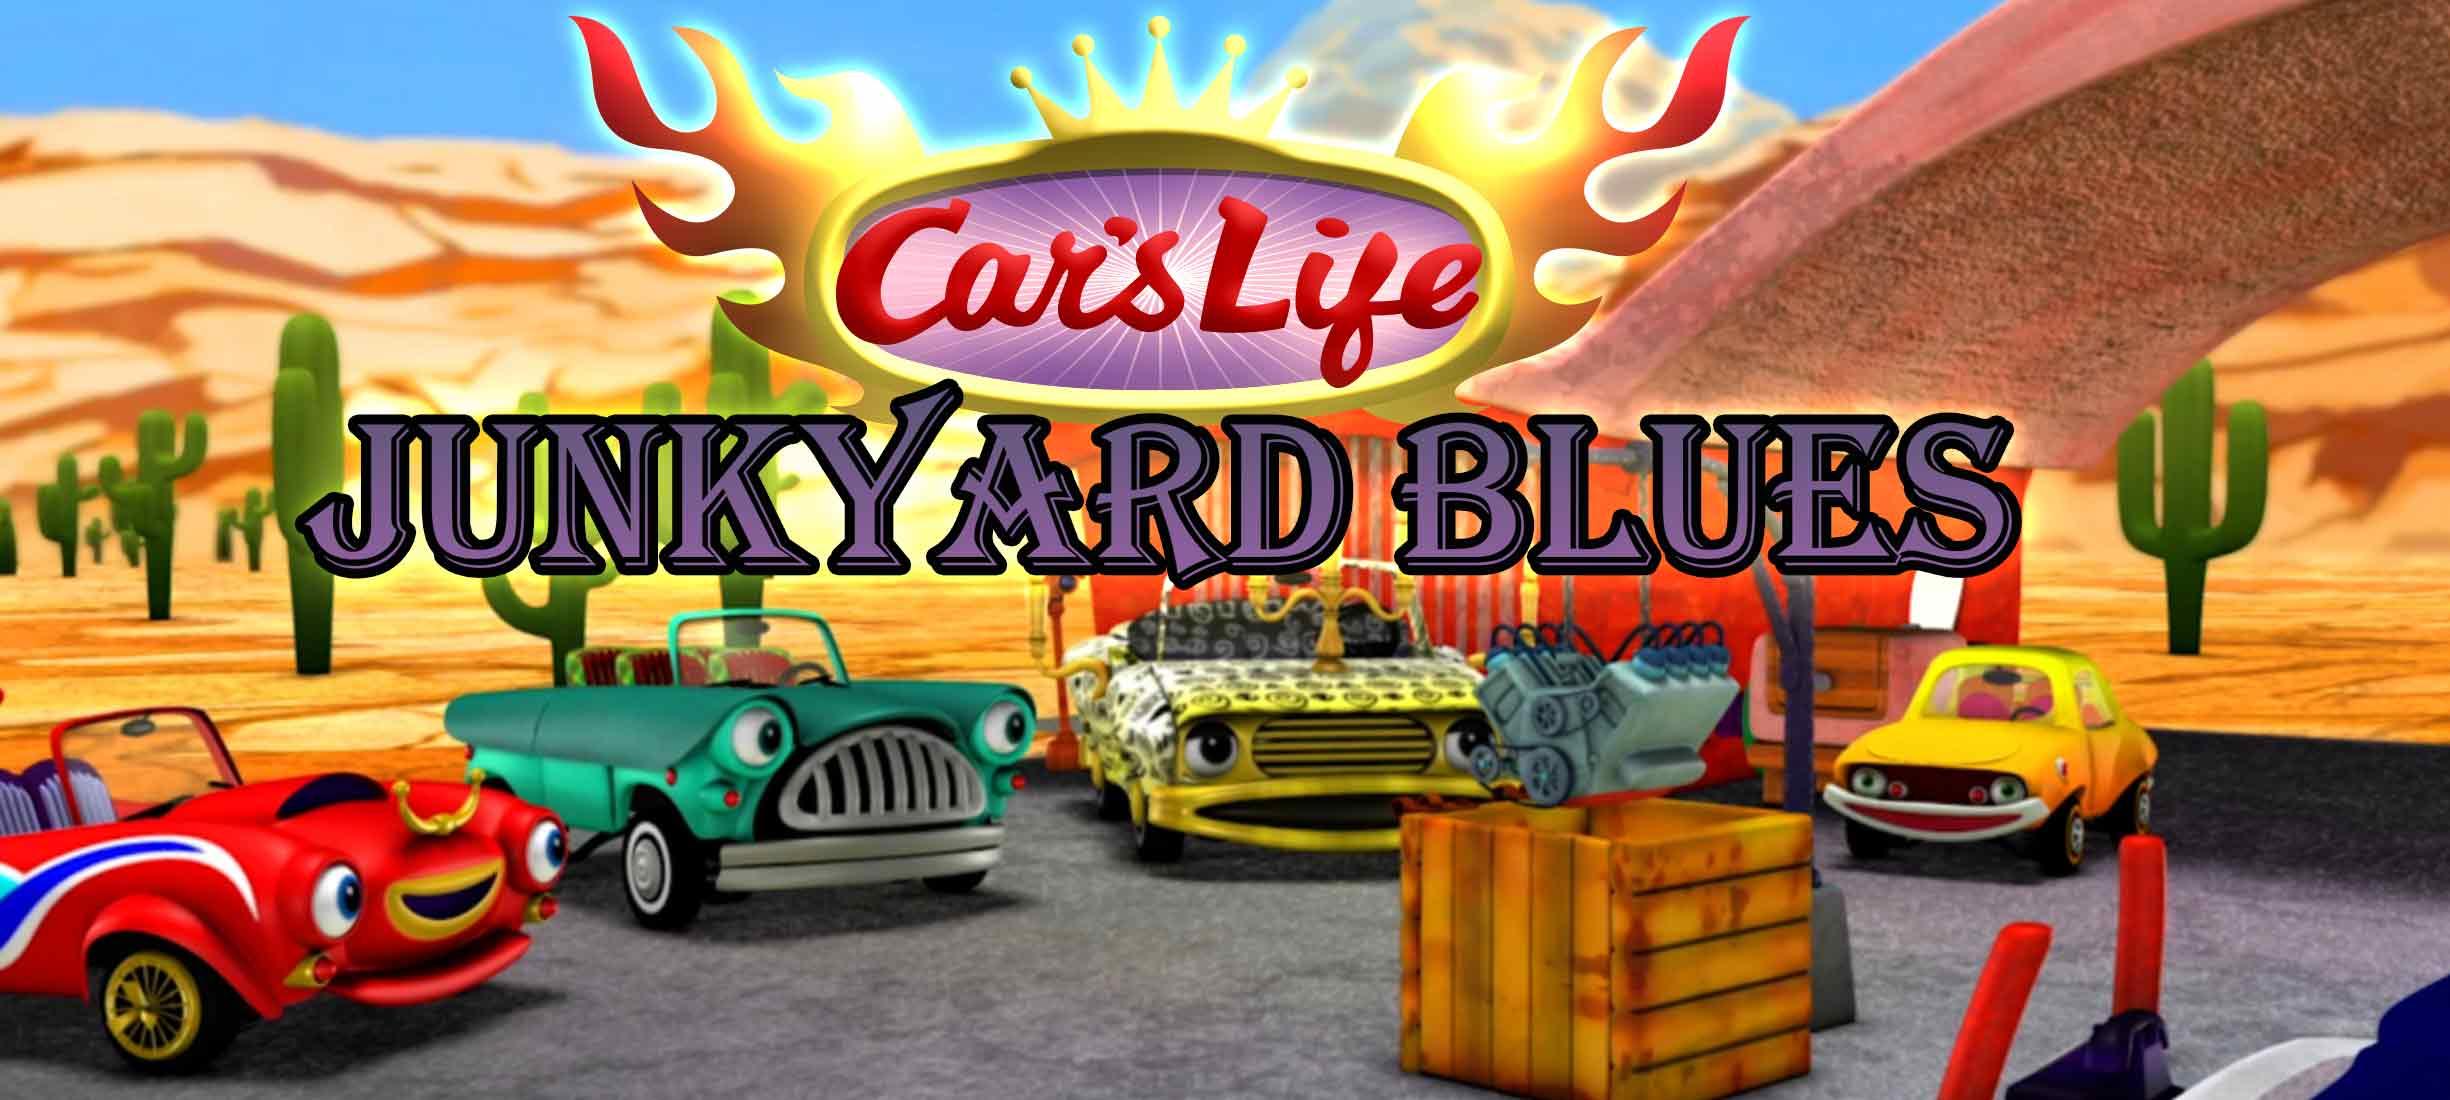 Watch Car\'s Life: Junkyard Blues Online - Pure Flix